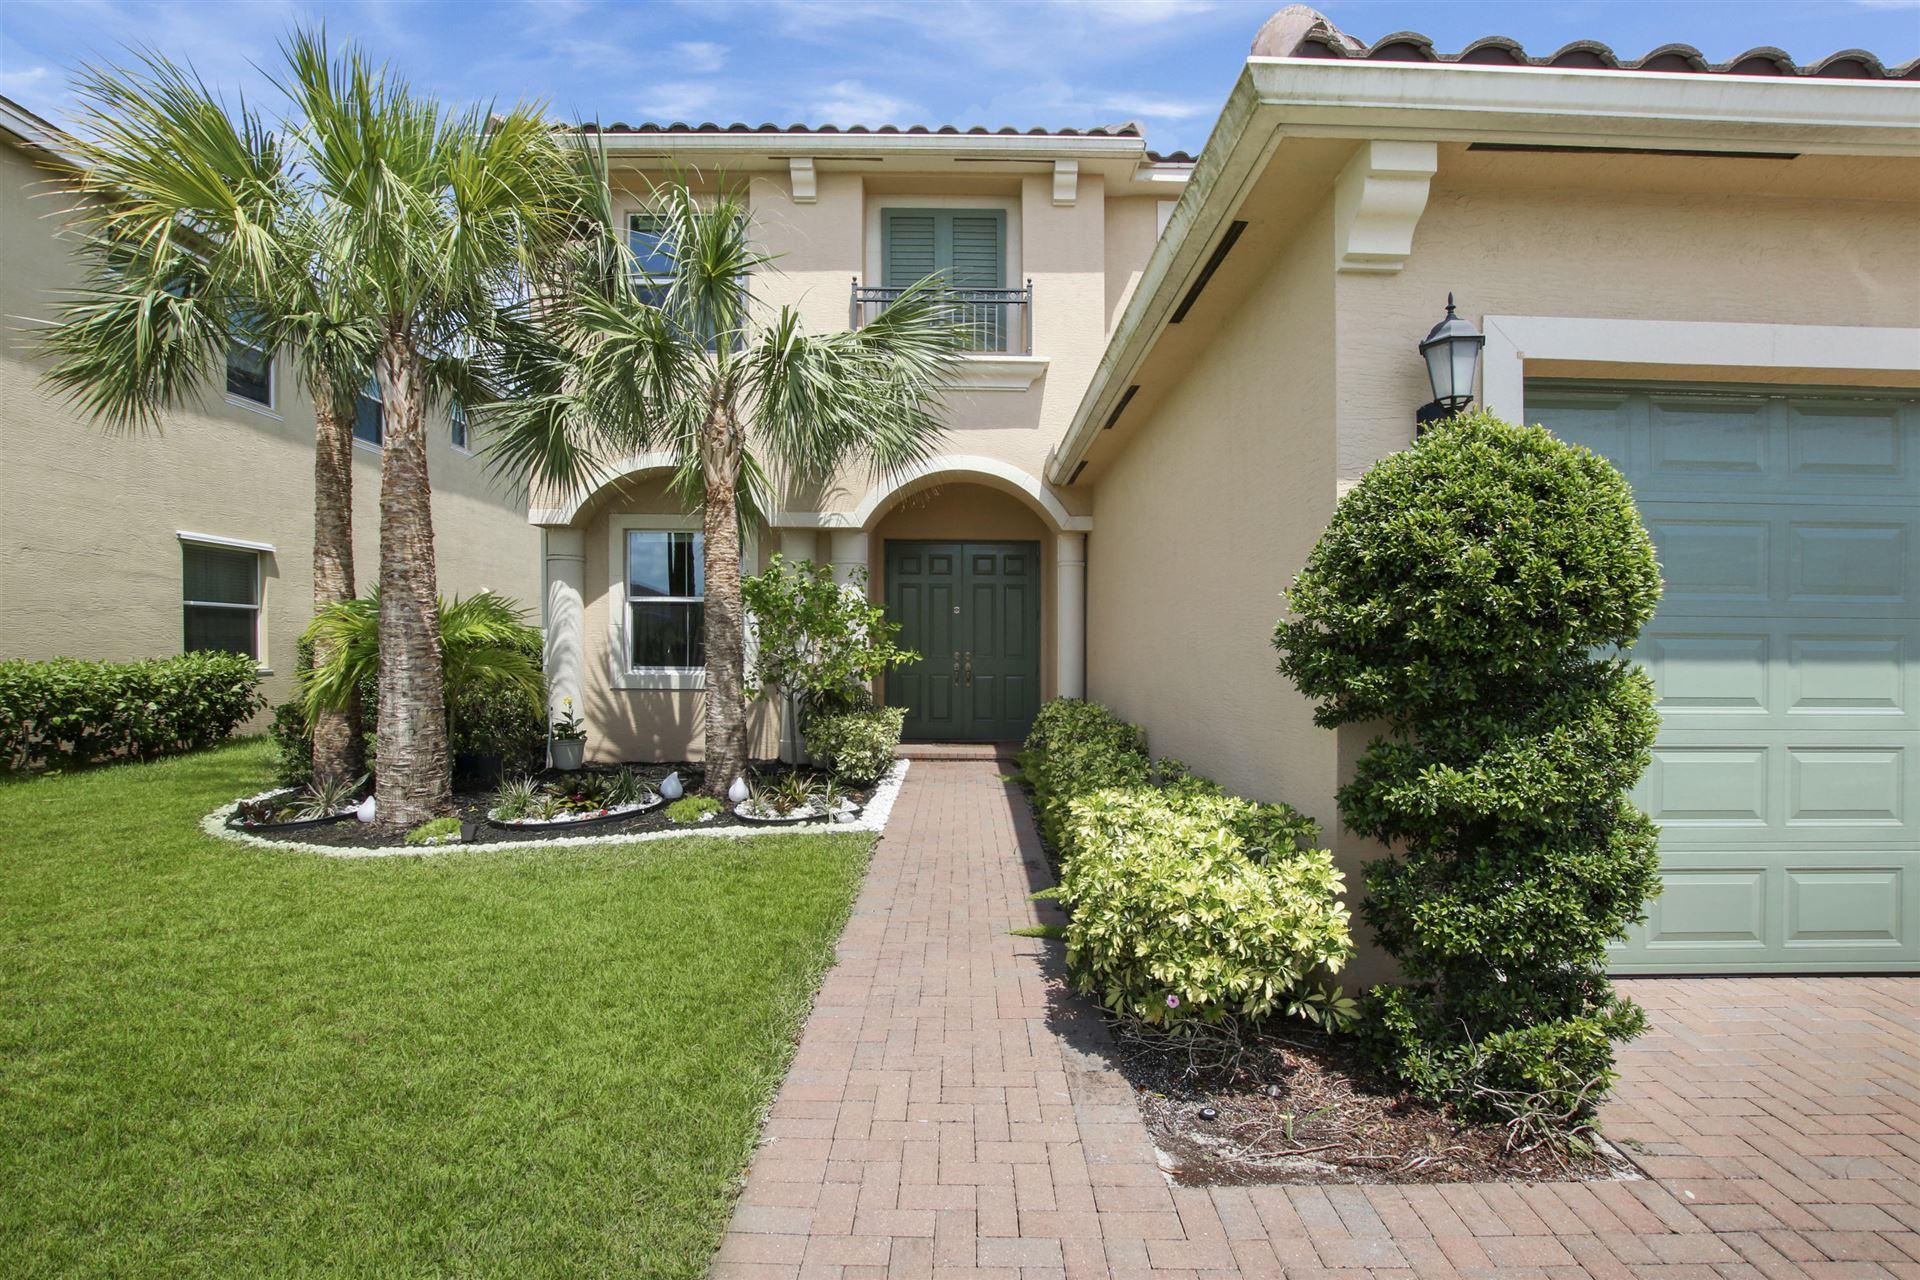 3012 Strada Court, Royal Palm Beach, FL 33411 - #: RX-10621649